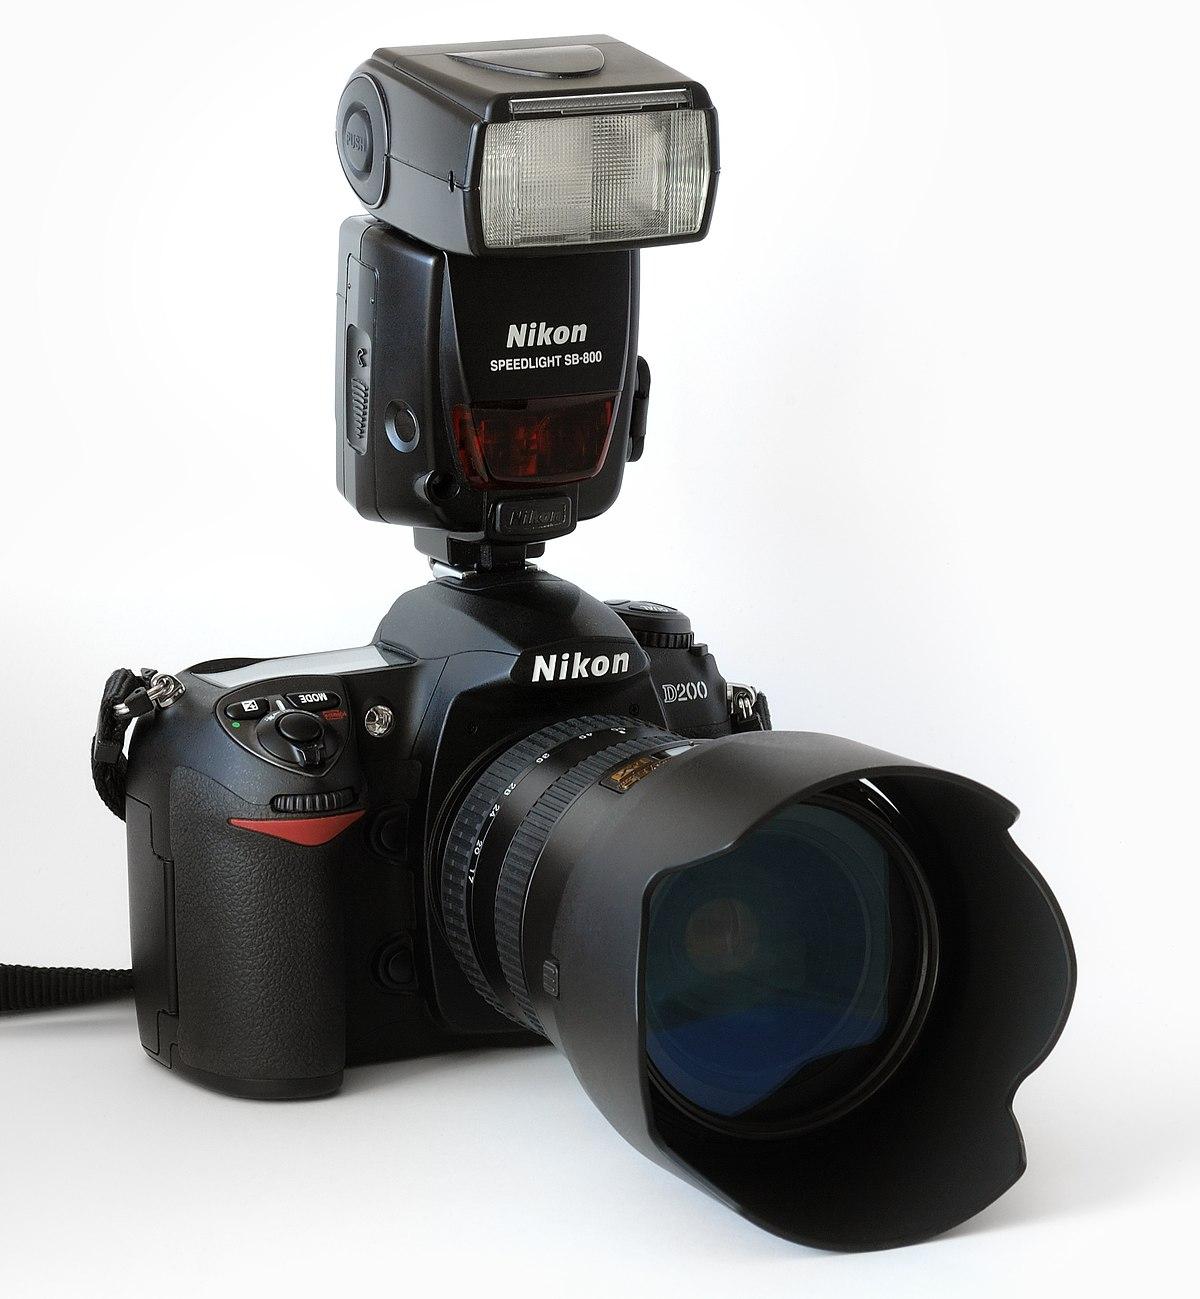 nikon d50 manual svenska how to and user guide instructions u2022 rh taxibermuda co Nikon D70 Manual Online Nikon D80